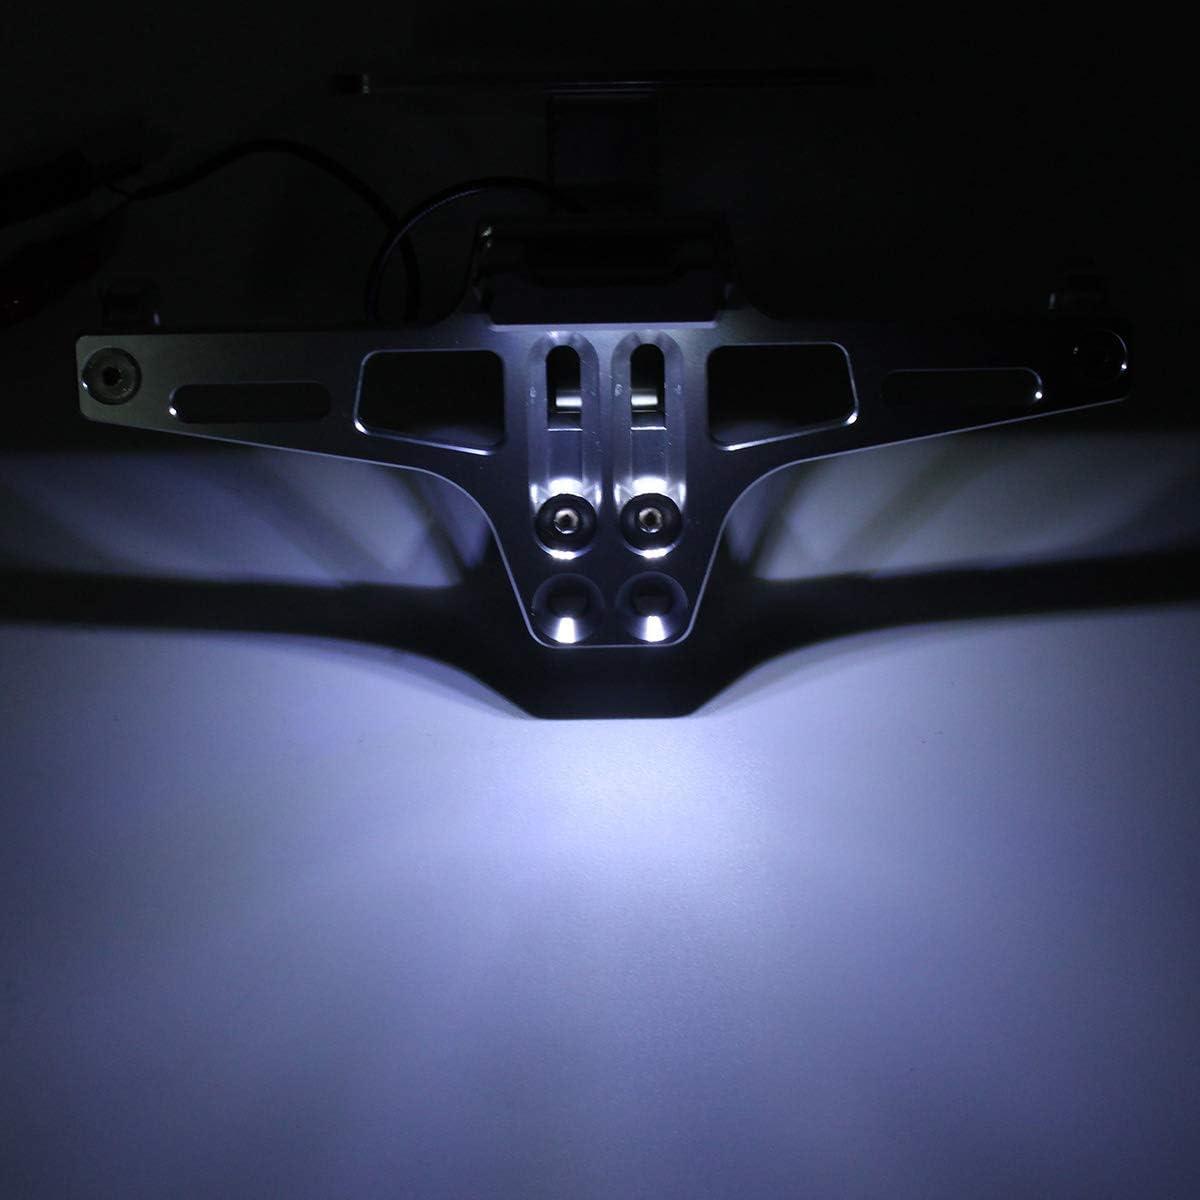 Dcolor CNC Frame Motorcycle License Plate Holder with LED Light Adjustable for Bws R25 R3 Mt03 Msx